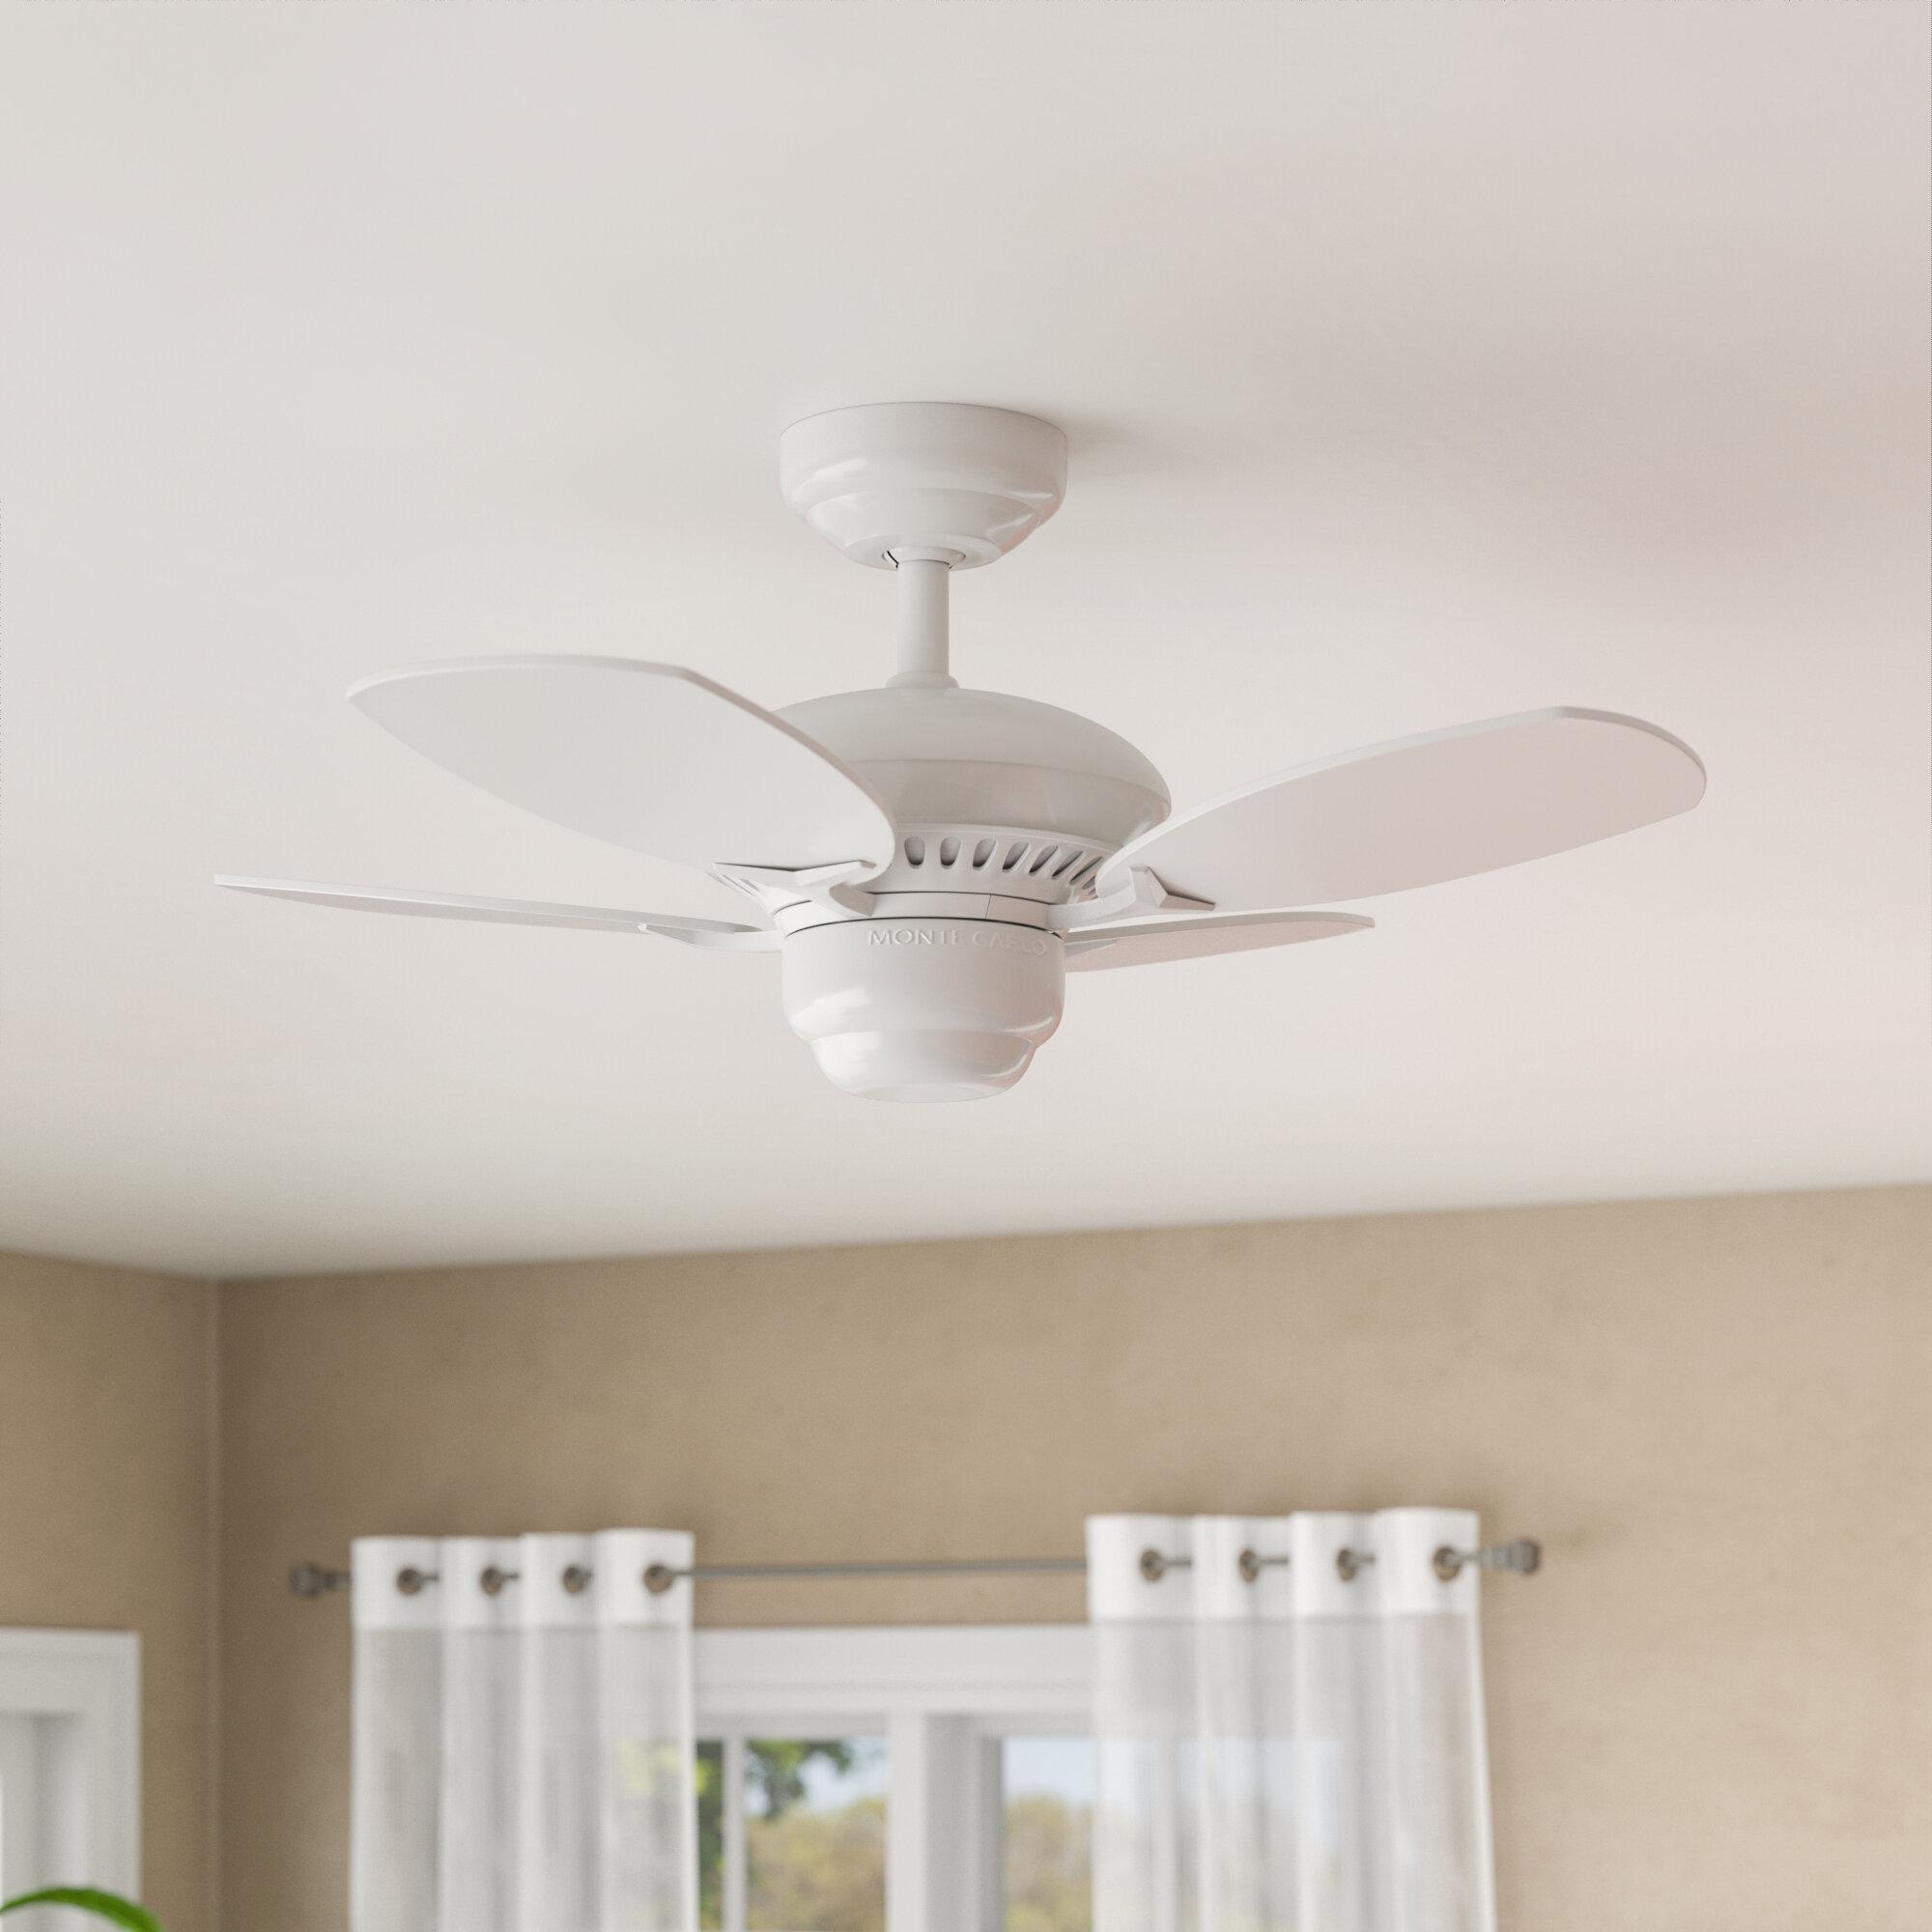 Charlton Home 28 Stewardson 4 Blade Standard Ceiling Fan With Pull Chain Reviews Wayfair Ca